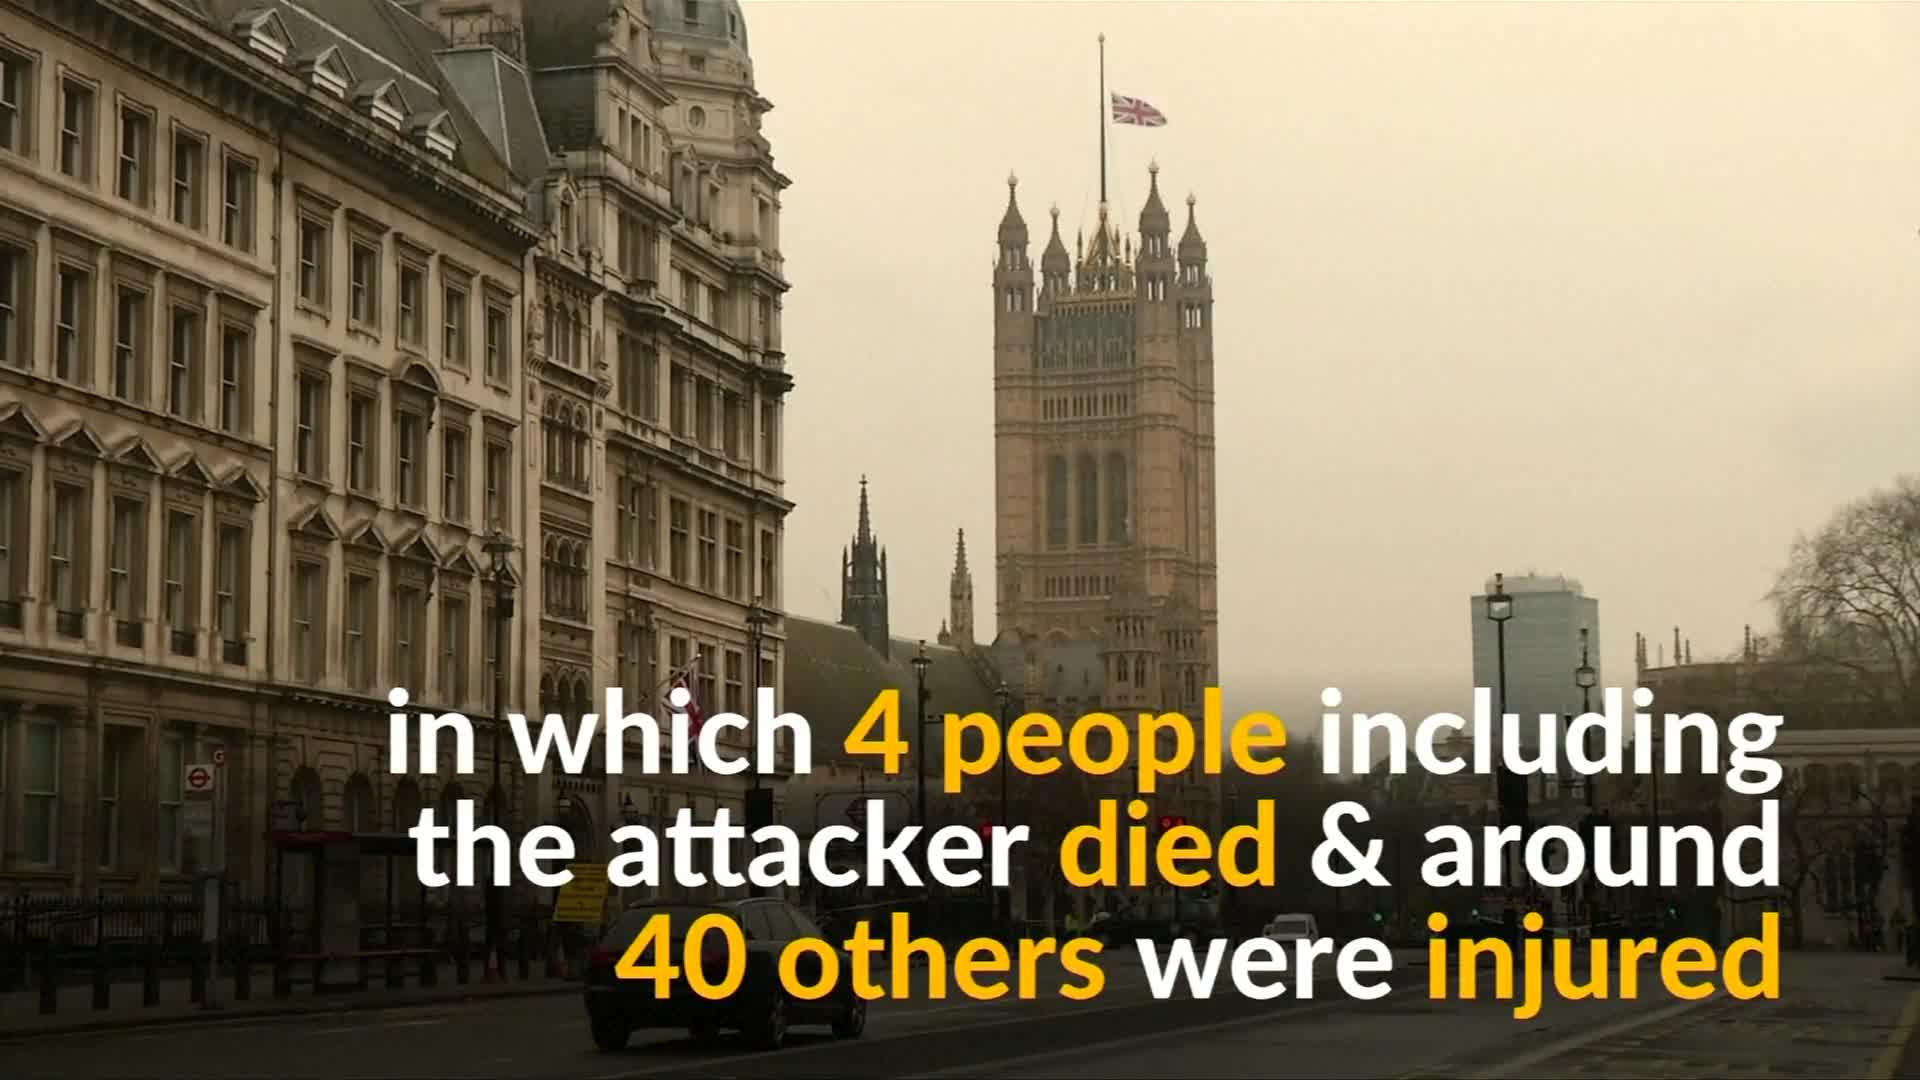 British PM says terrorism will not prevail